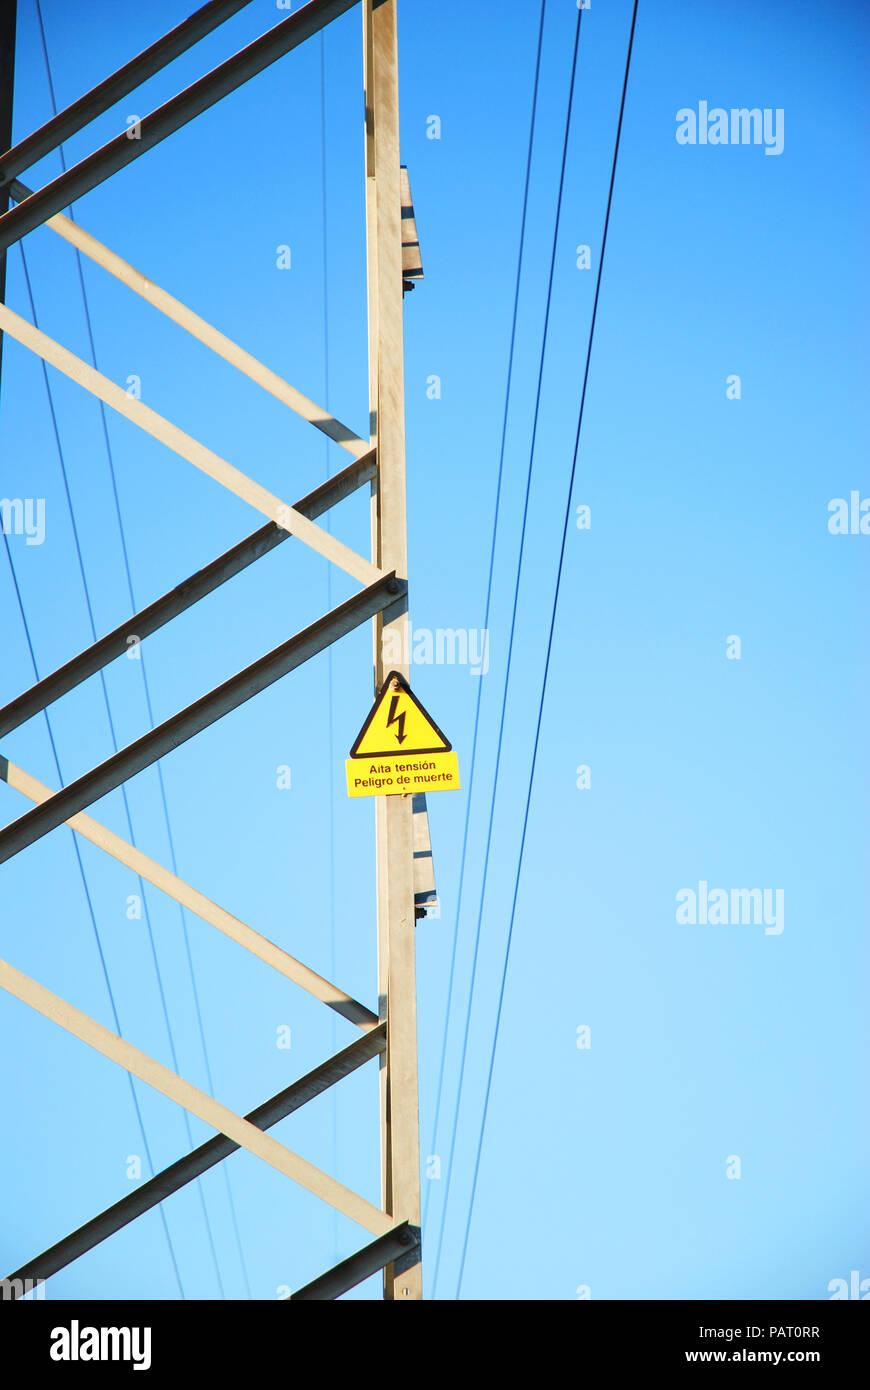 Electricity pylon. Close view. Stock Photo